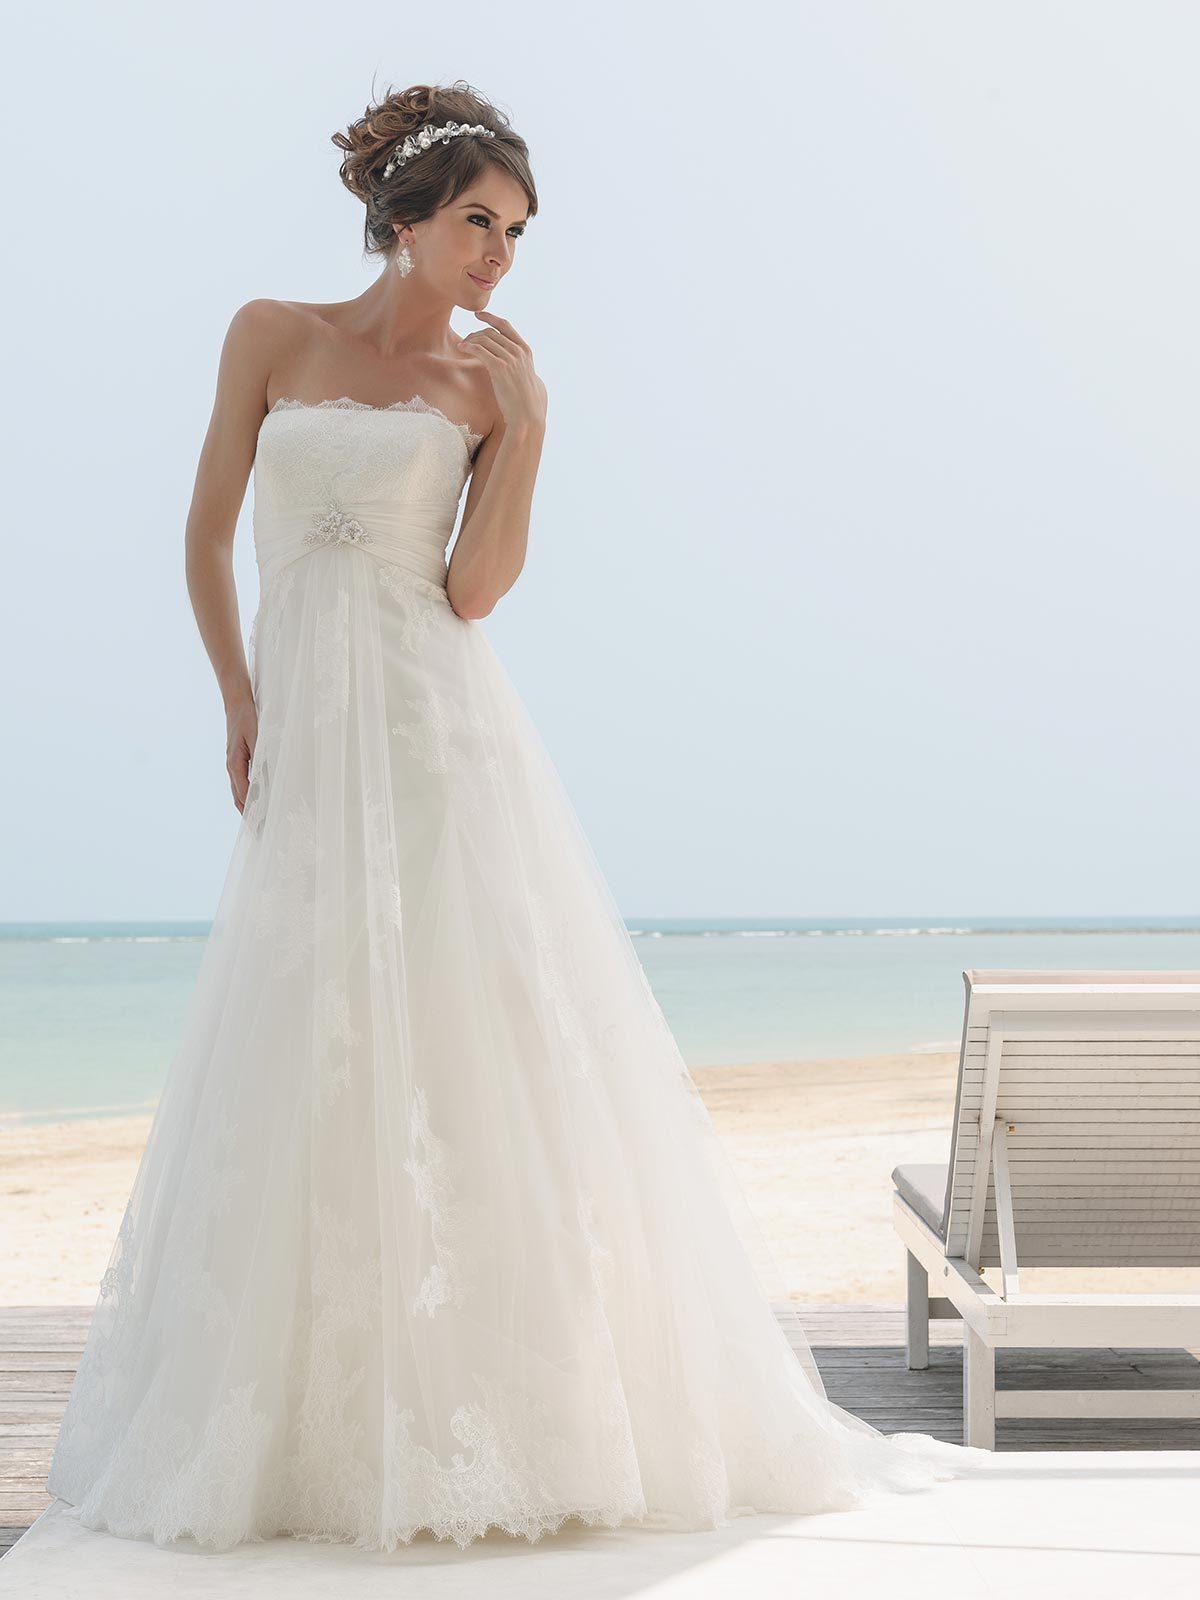 Brautkleid Meridiana von Marylise auf Ja.de